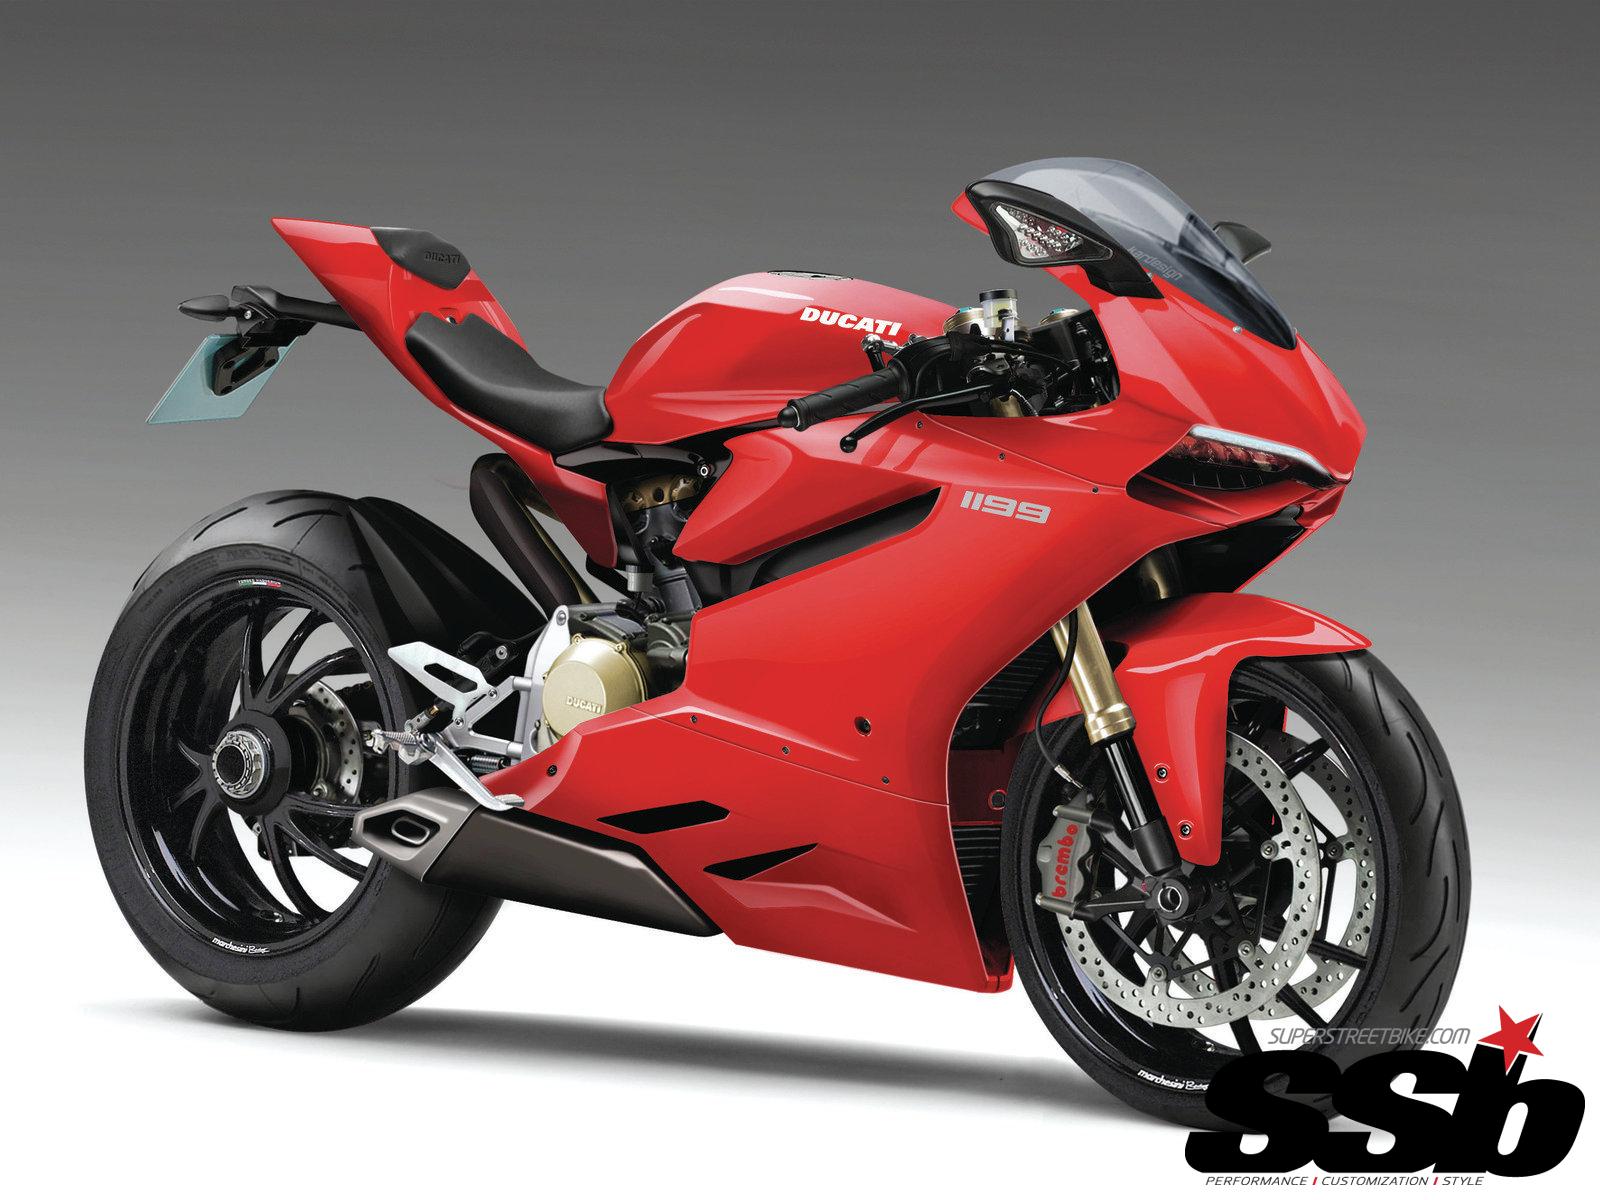 Spy shot of Ducati's 2012 superbike... - Page 13 - ducati.org forum